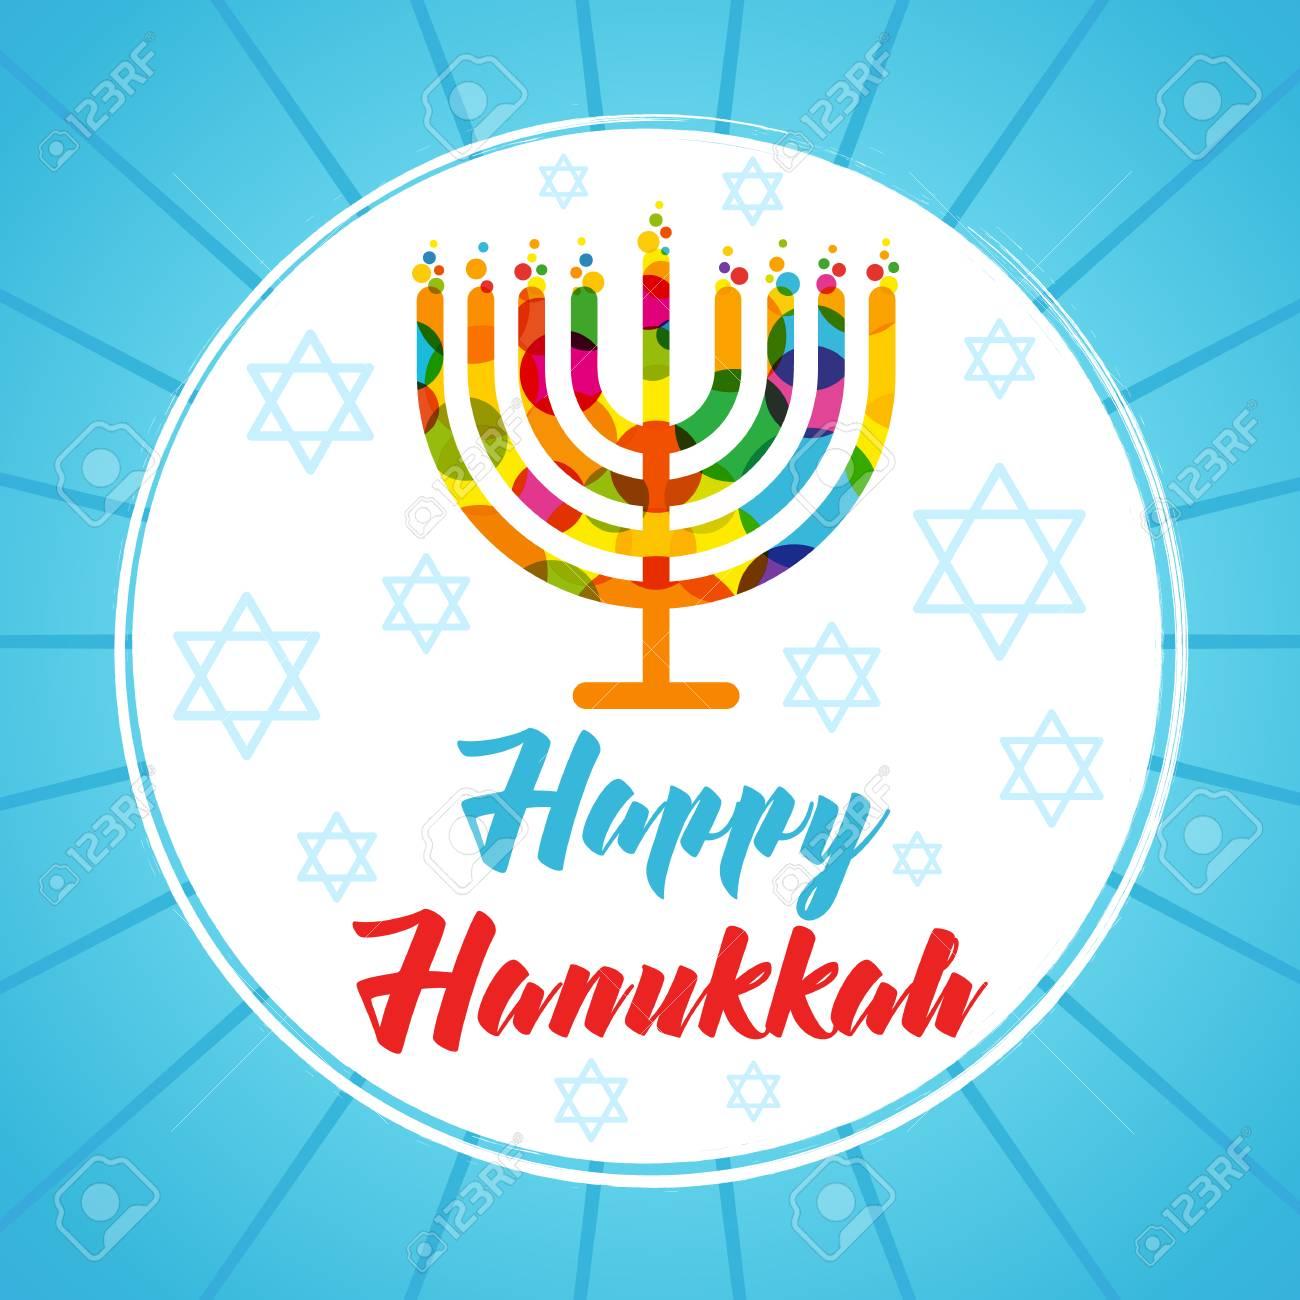 Hanukkah greeting card menorah candles colored jewish holiday hanukkah greeting card menorah candles colored jewish holiday hanukkah greeting card traditional chanukah symbol menorah m4hsunfo